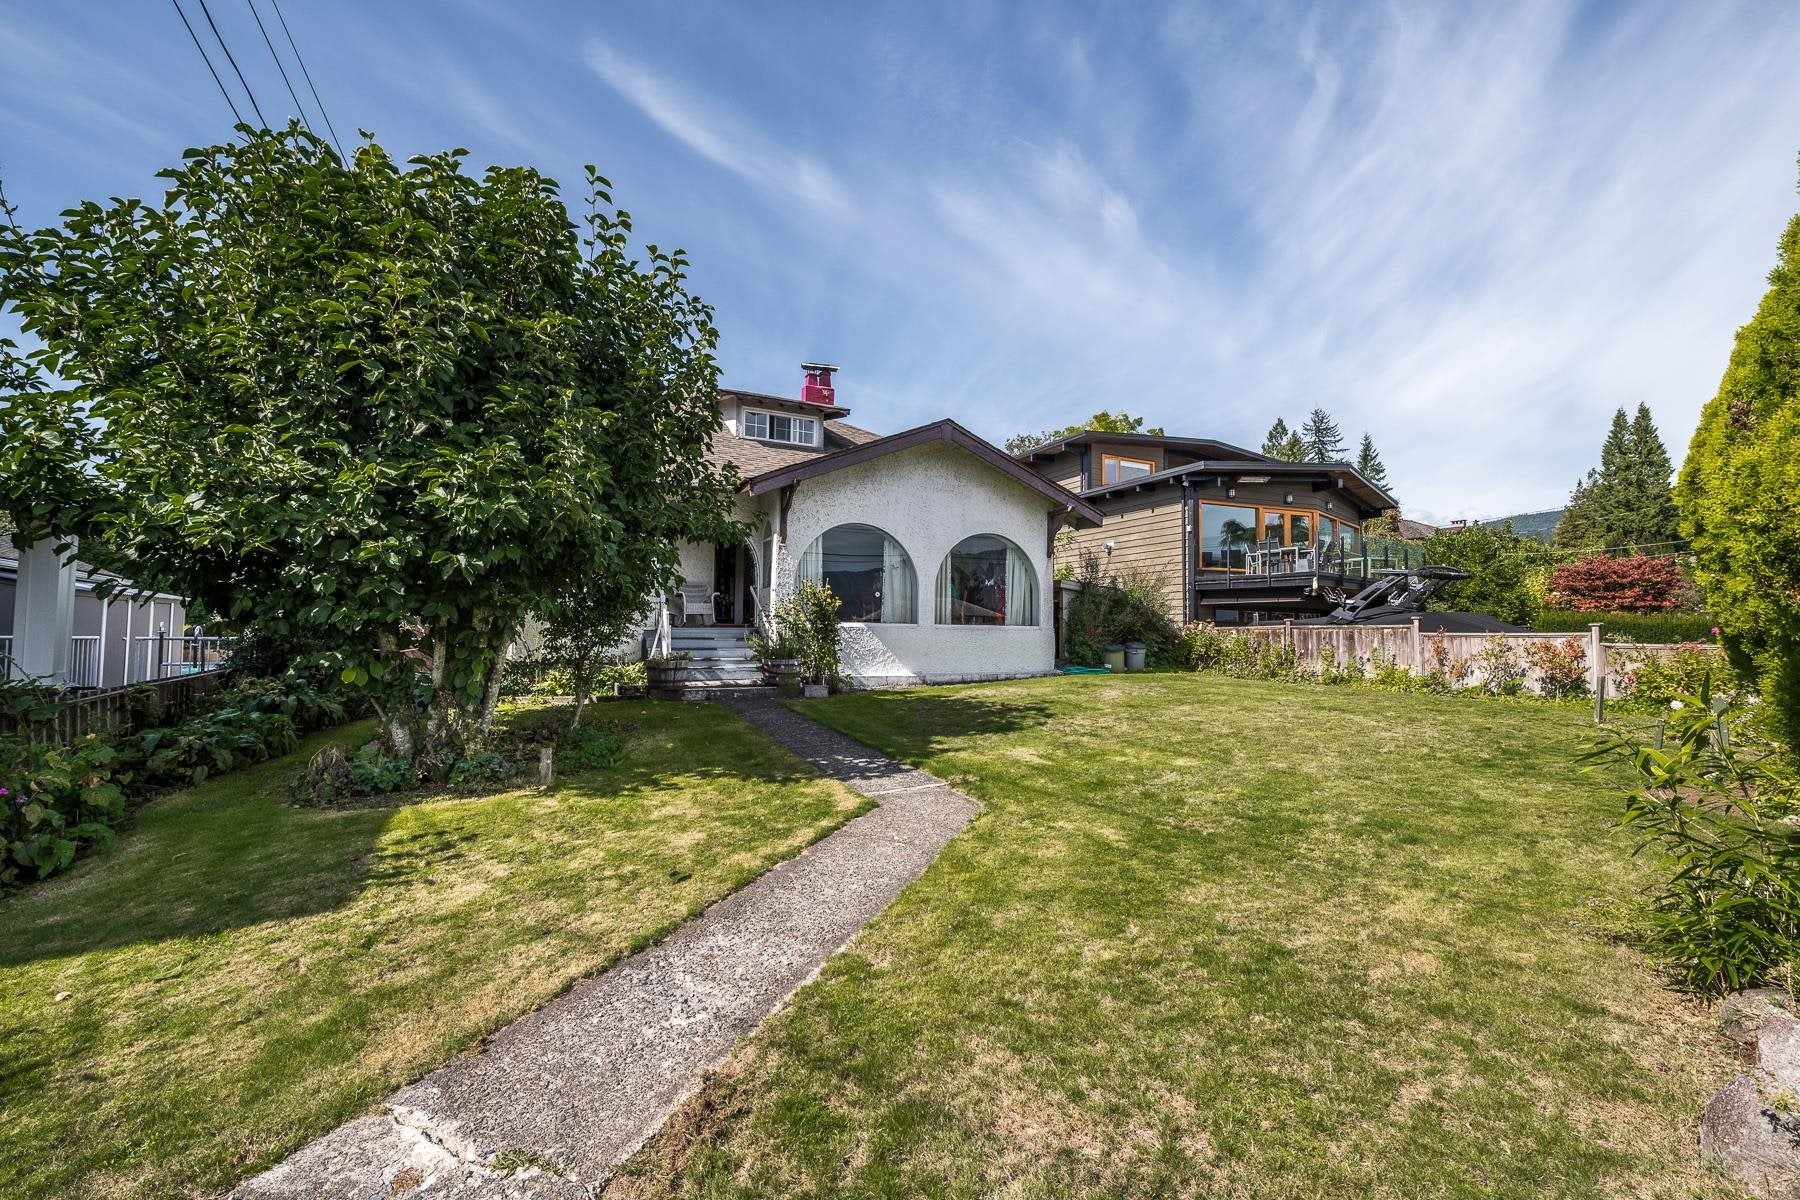 525 BEACHVIEW DRIVE - Dollarton House/Single Family for sale, 3 Bedrooms (R2620575) - #1